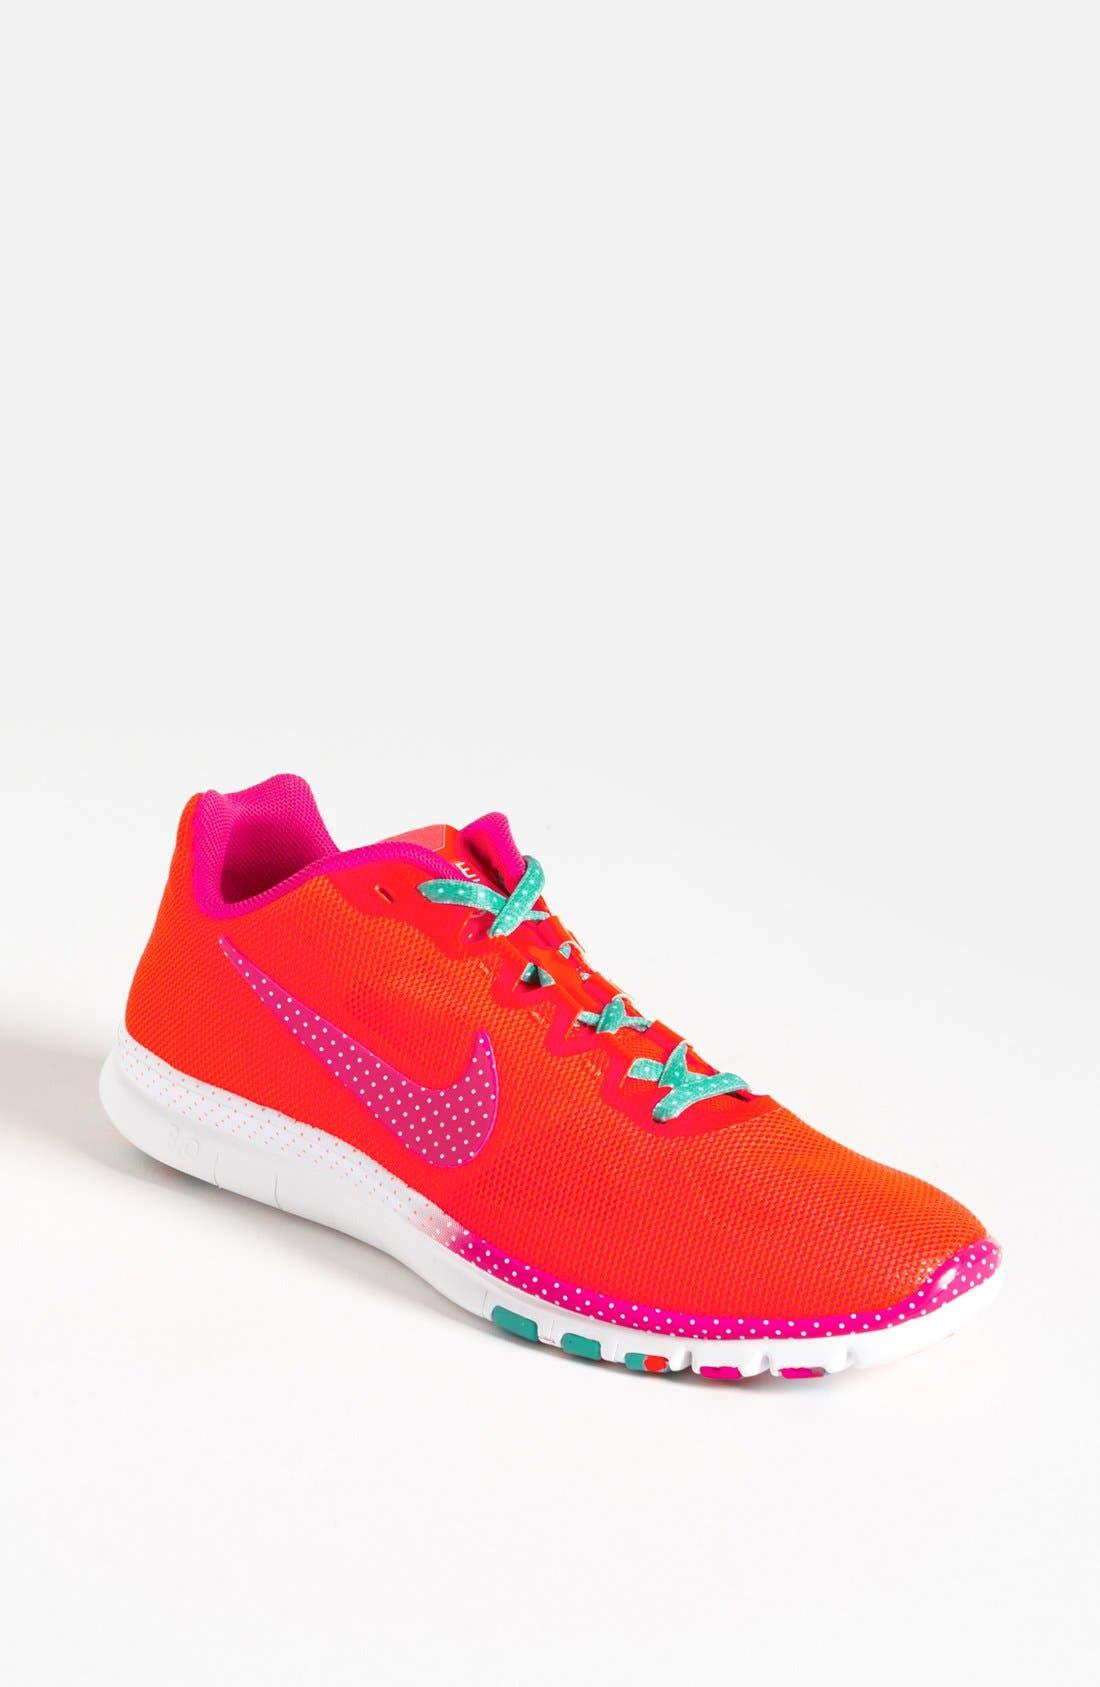 Alternate Image 1 Selected - Nike 'Free Advantage 3.0' Training Shoe (Women)